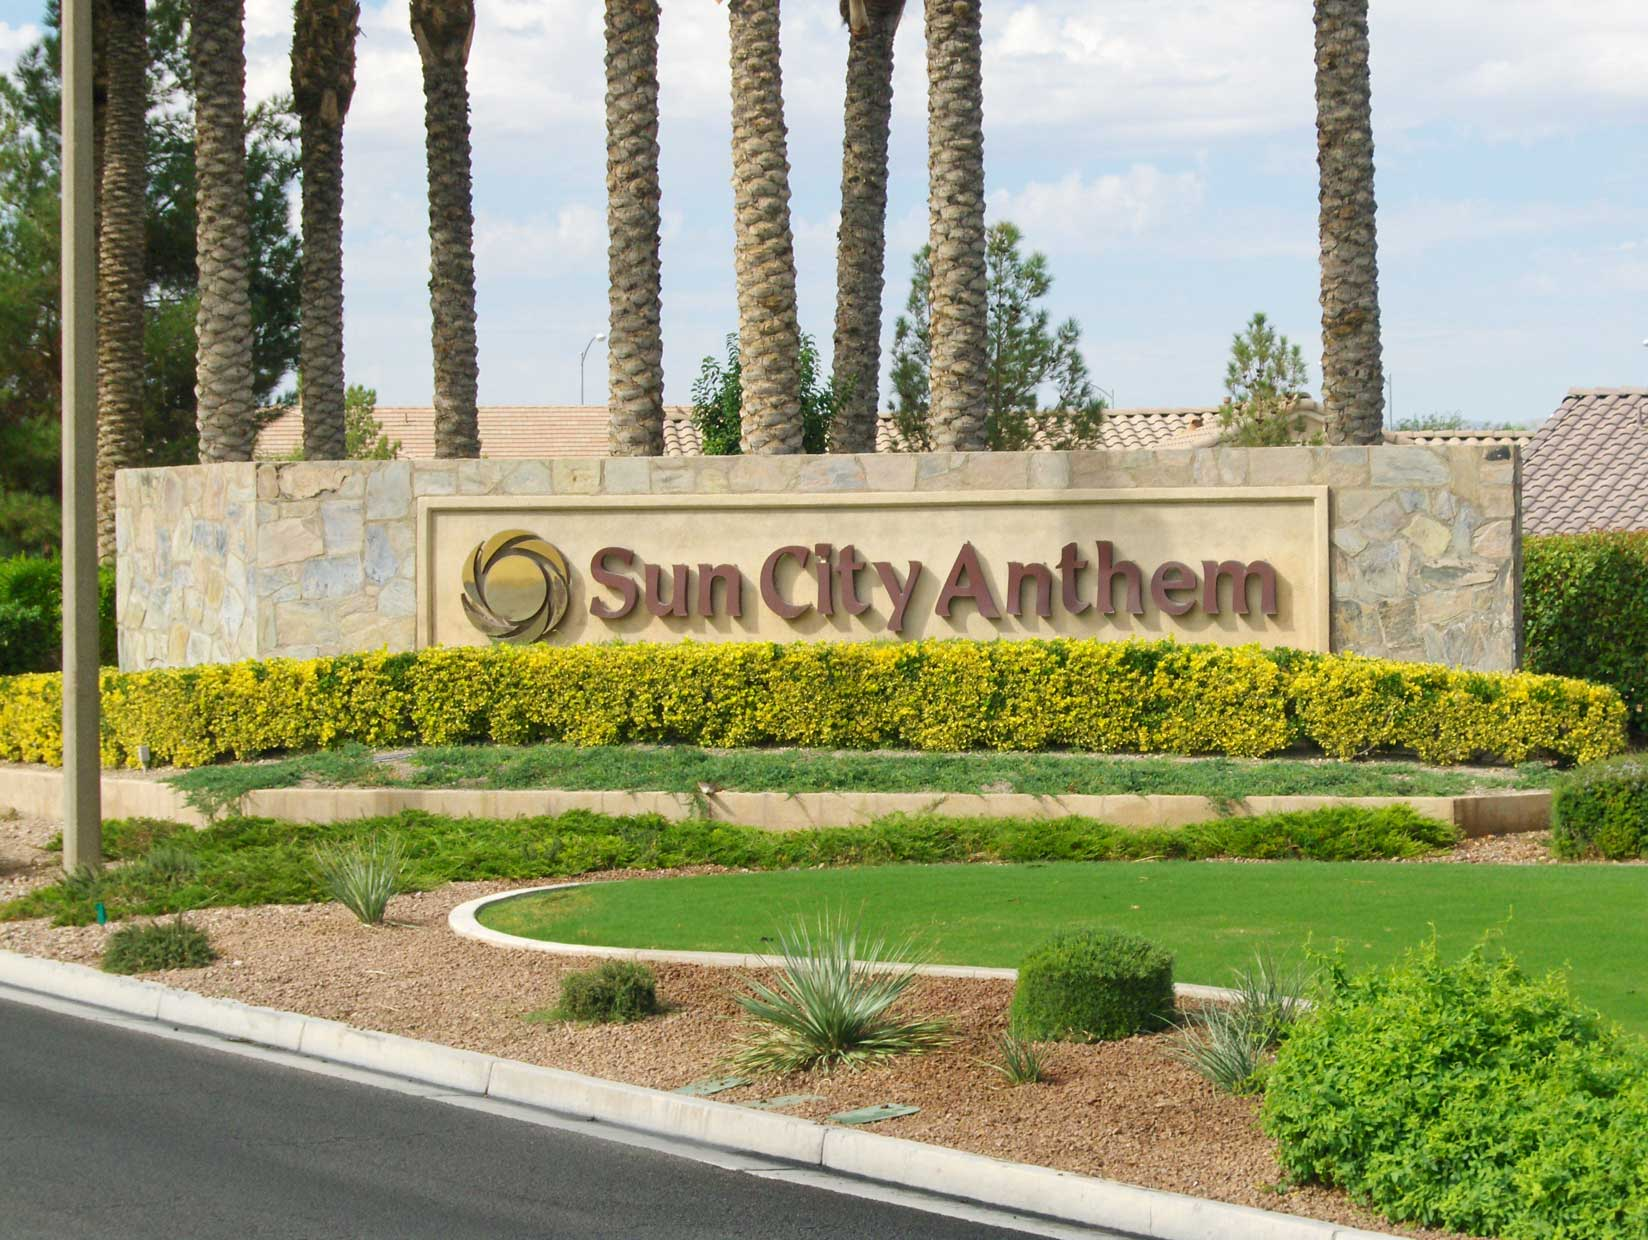 Suncityanthem